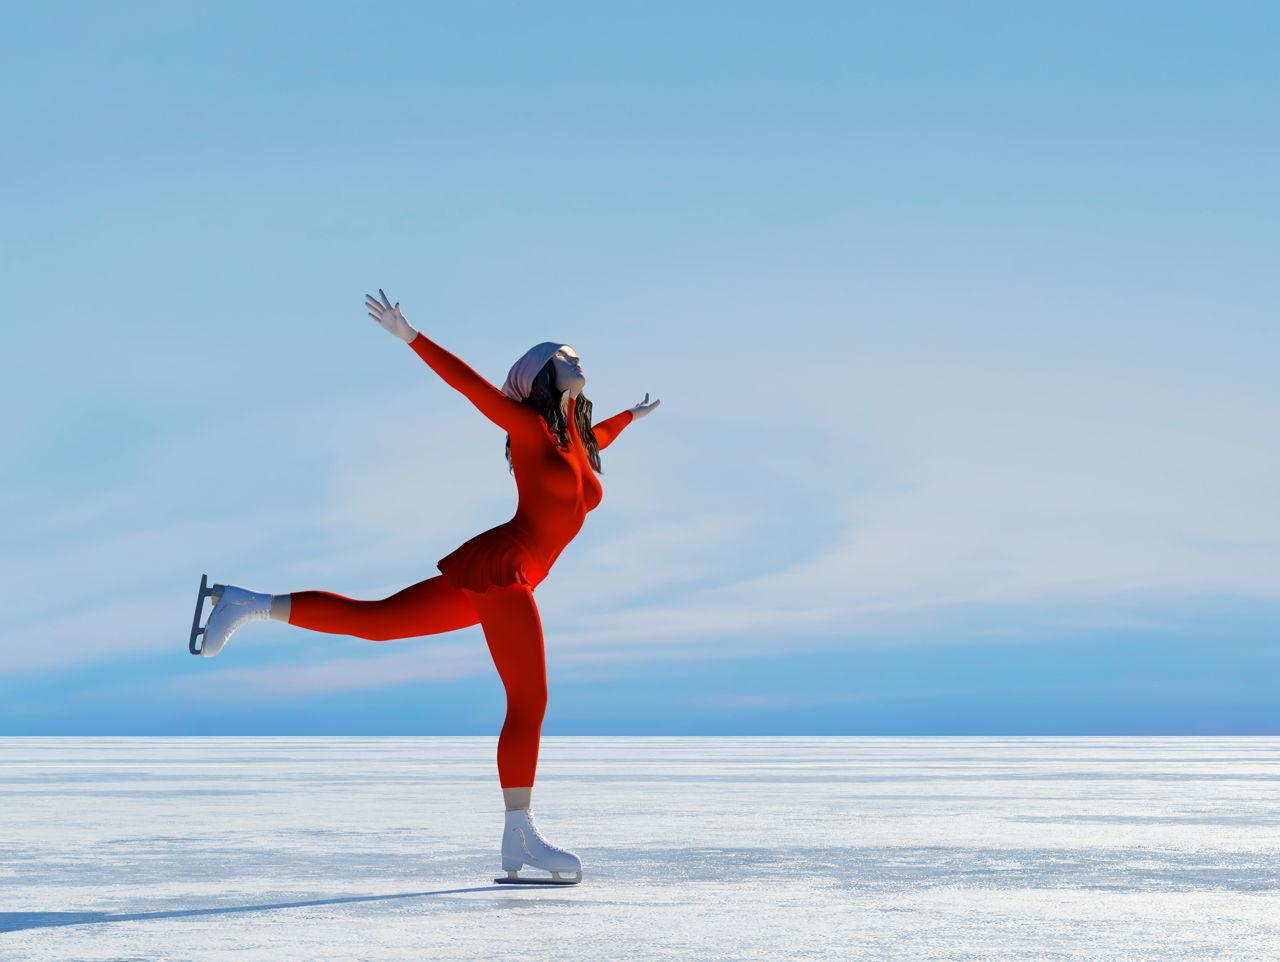 Ice Skating Terms